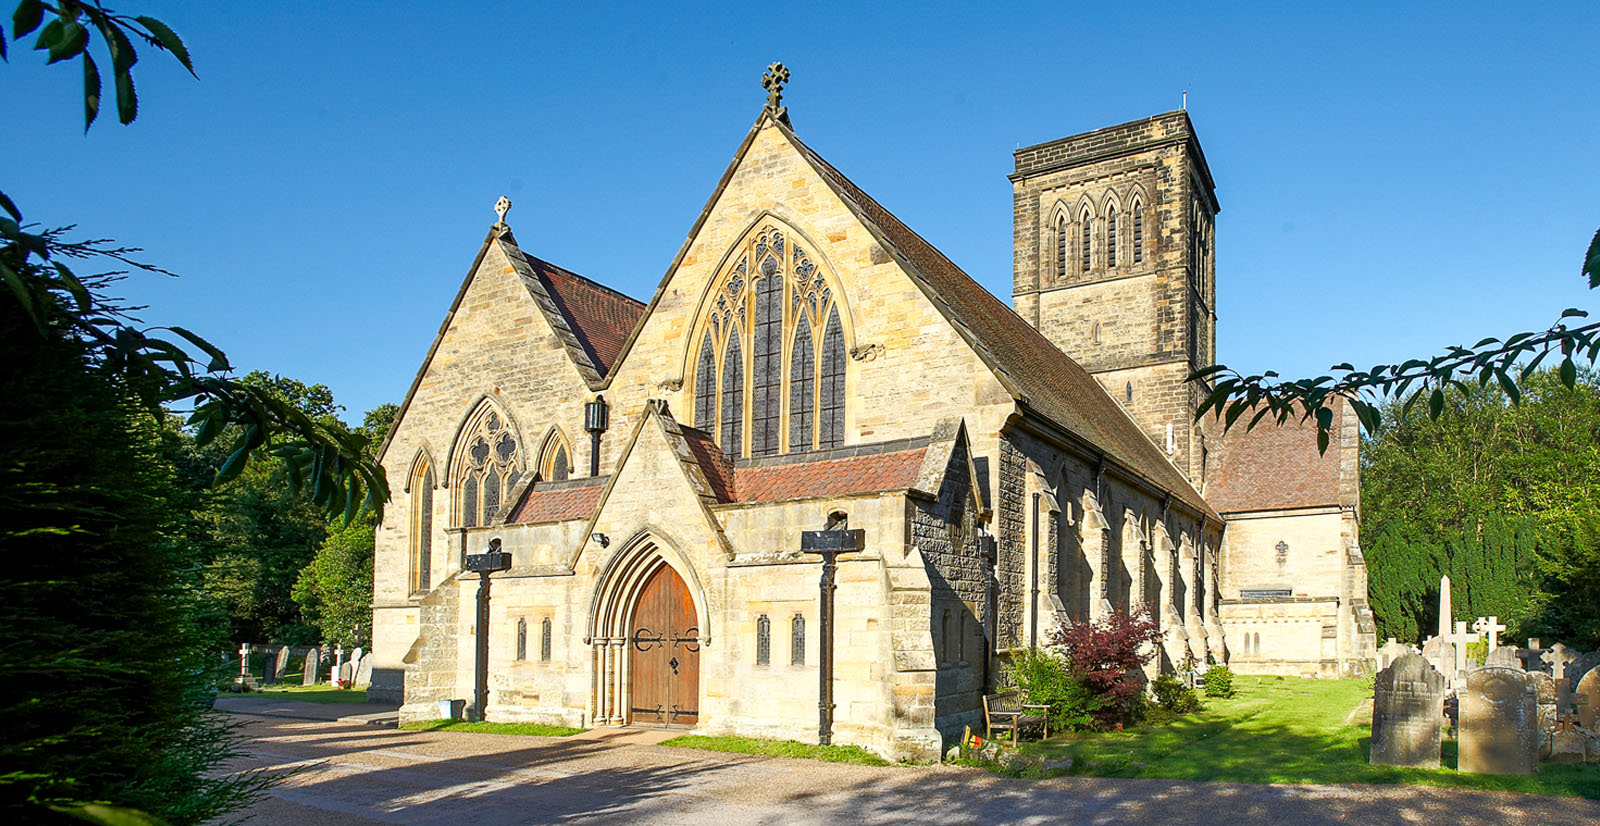 St Paul's Church - Rusthall Village - by David Hodgkinson